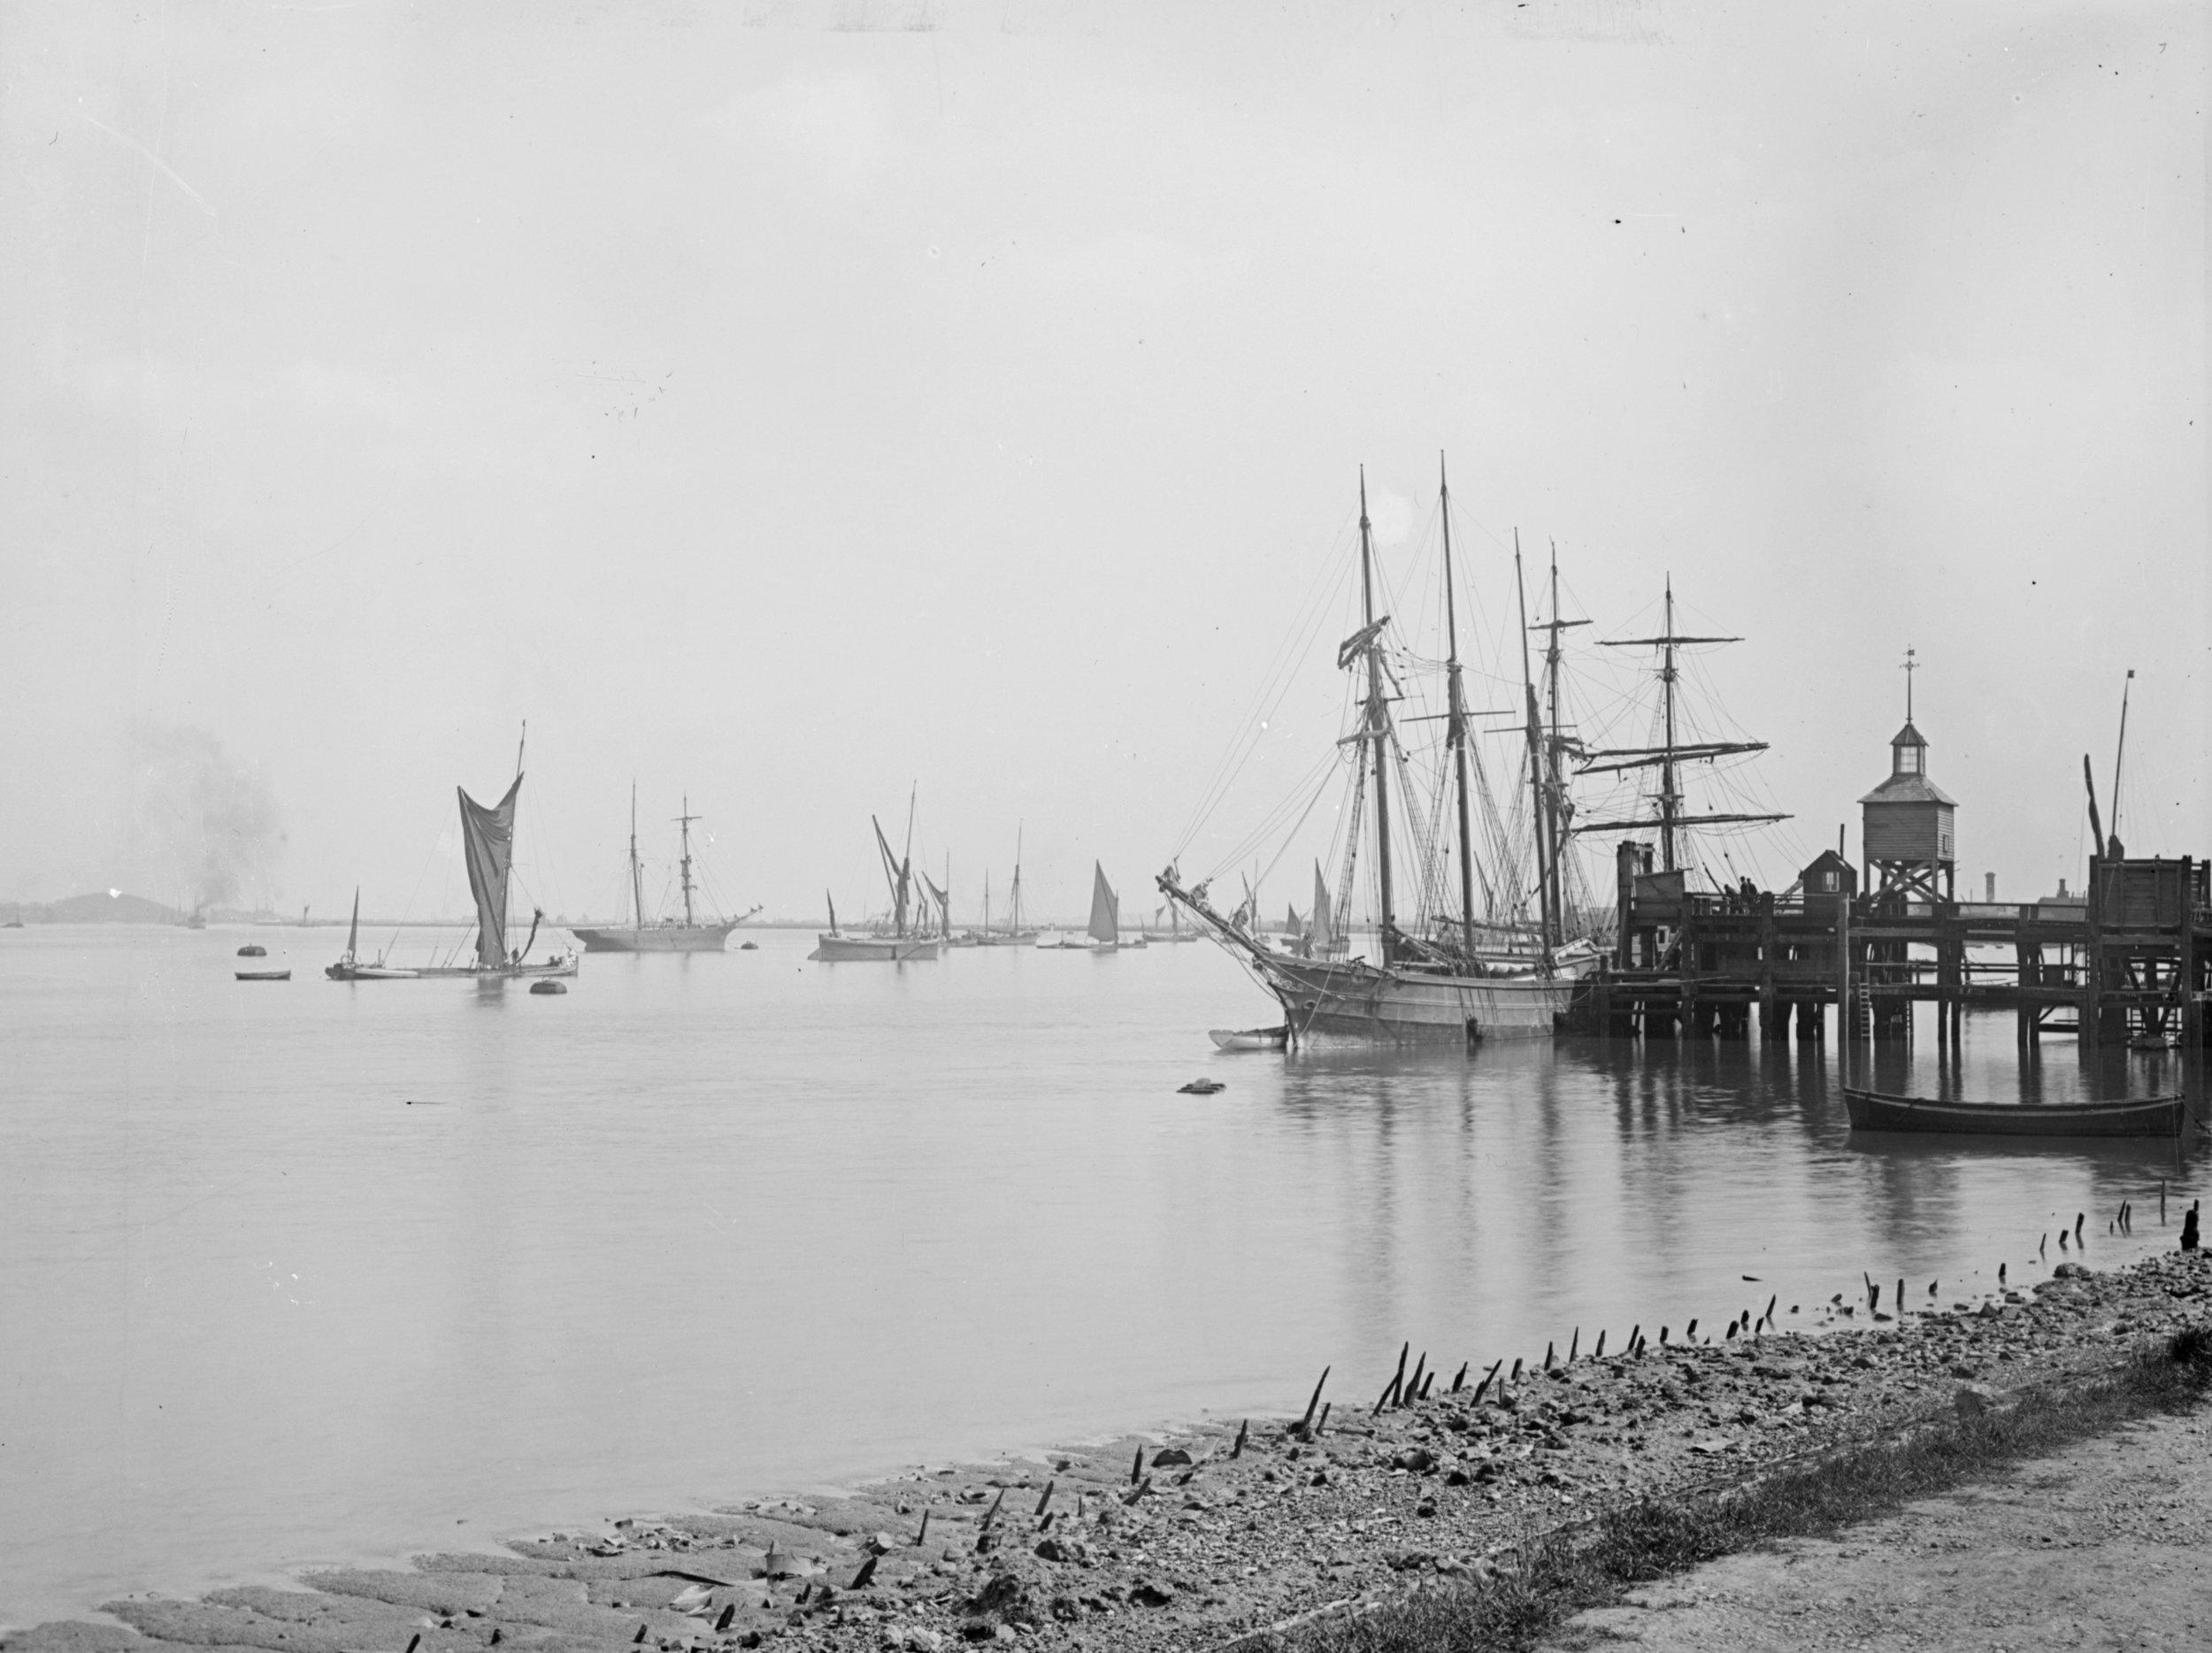 Sailing Ship Moored by Erith Ballast Wharf (1906)